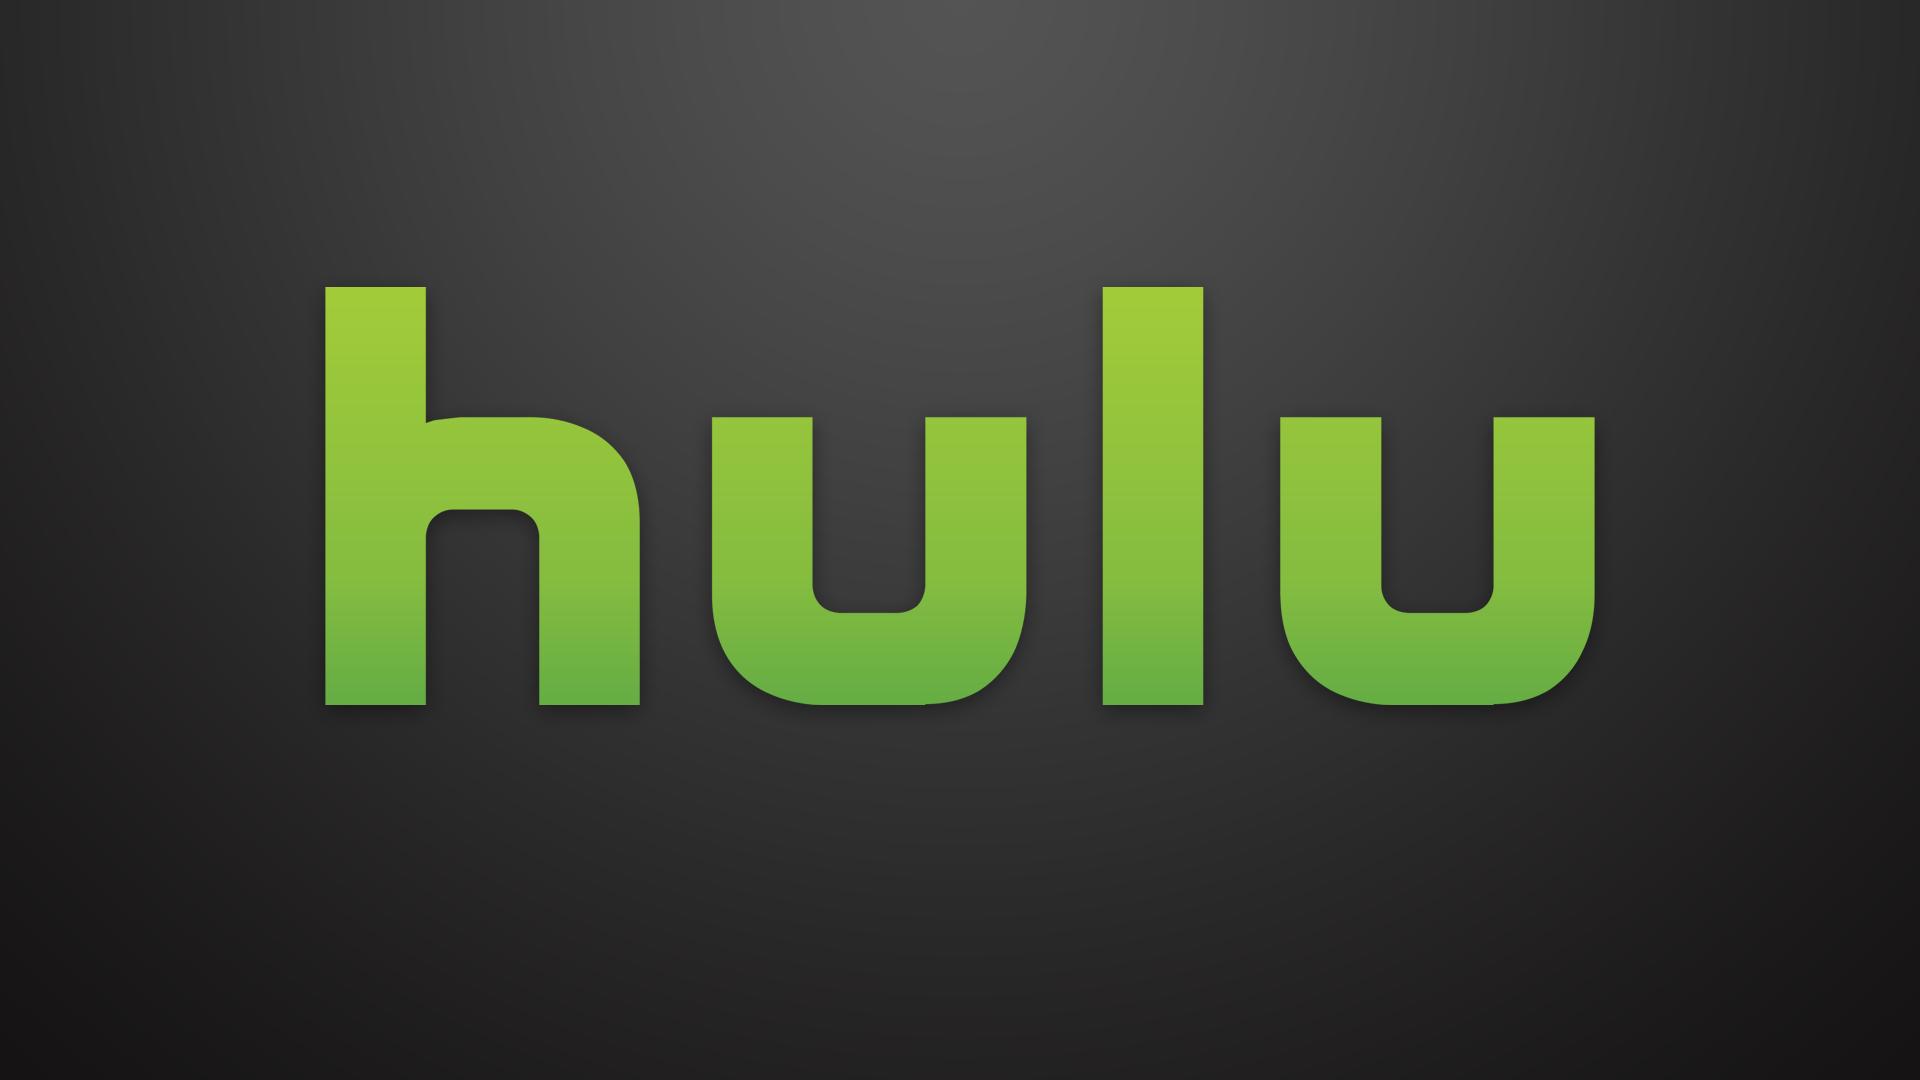 Report hulu considers offering a pricier ad free tier techcrunch biocorpaavc Gallery